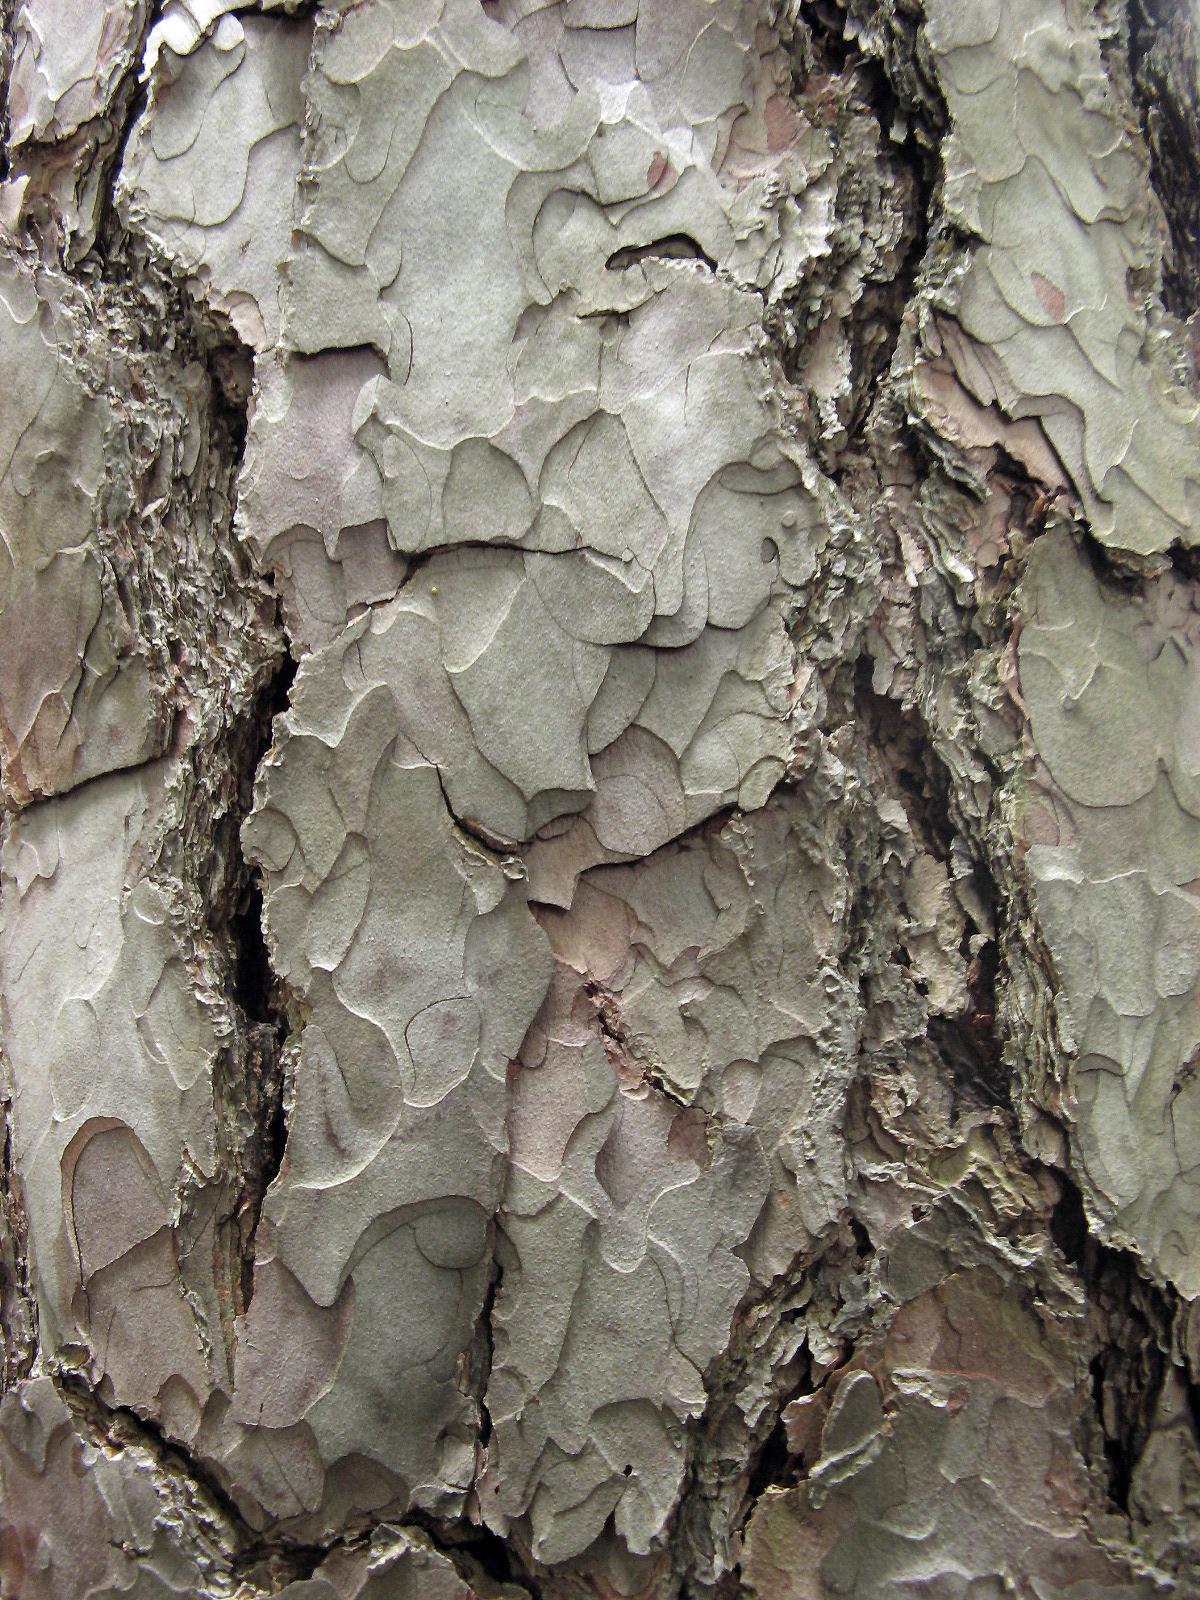 Trunk Texture, Bspo06, Nature, Rough, Surface, HQ Photo